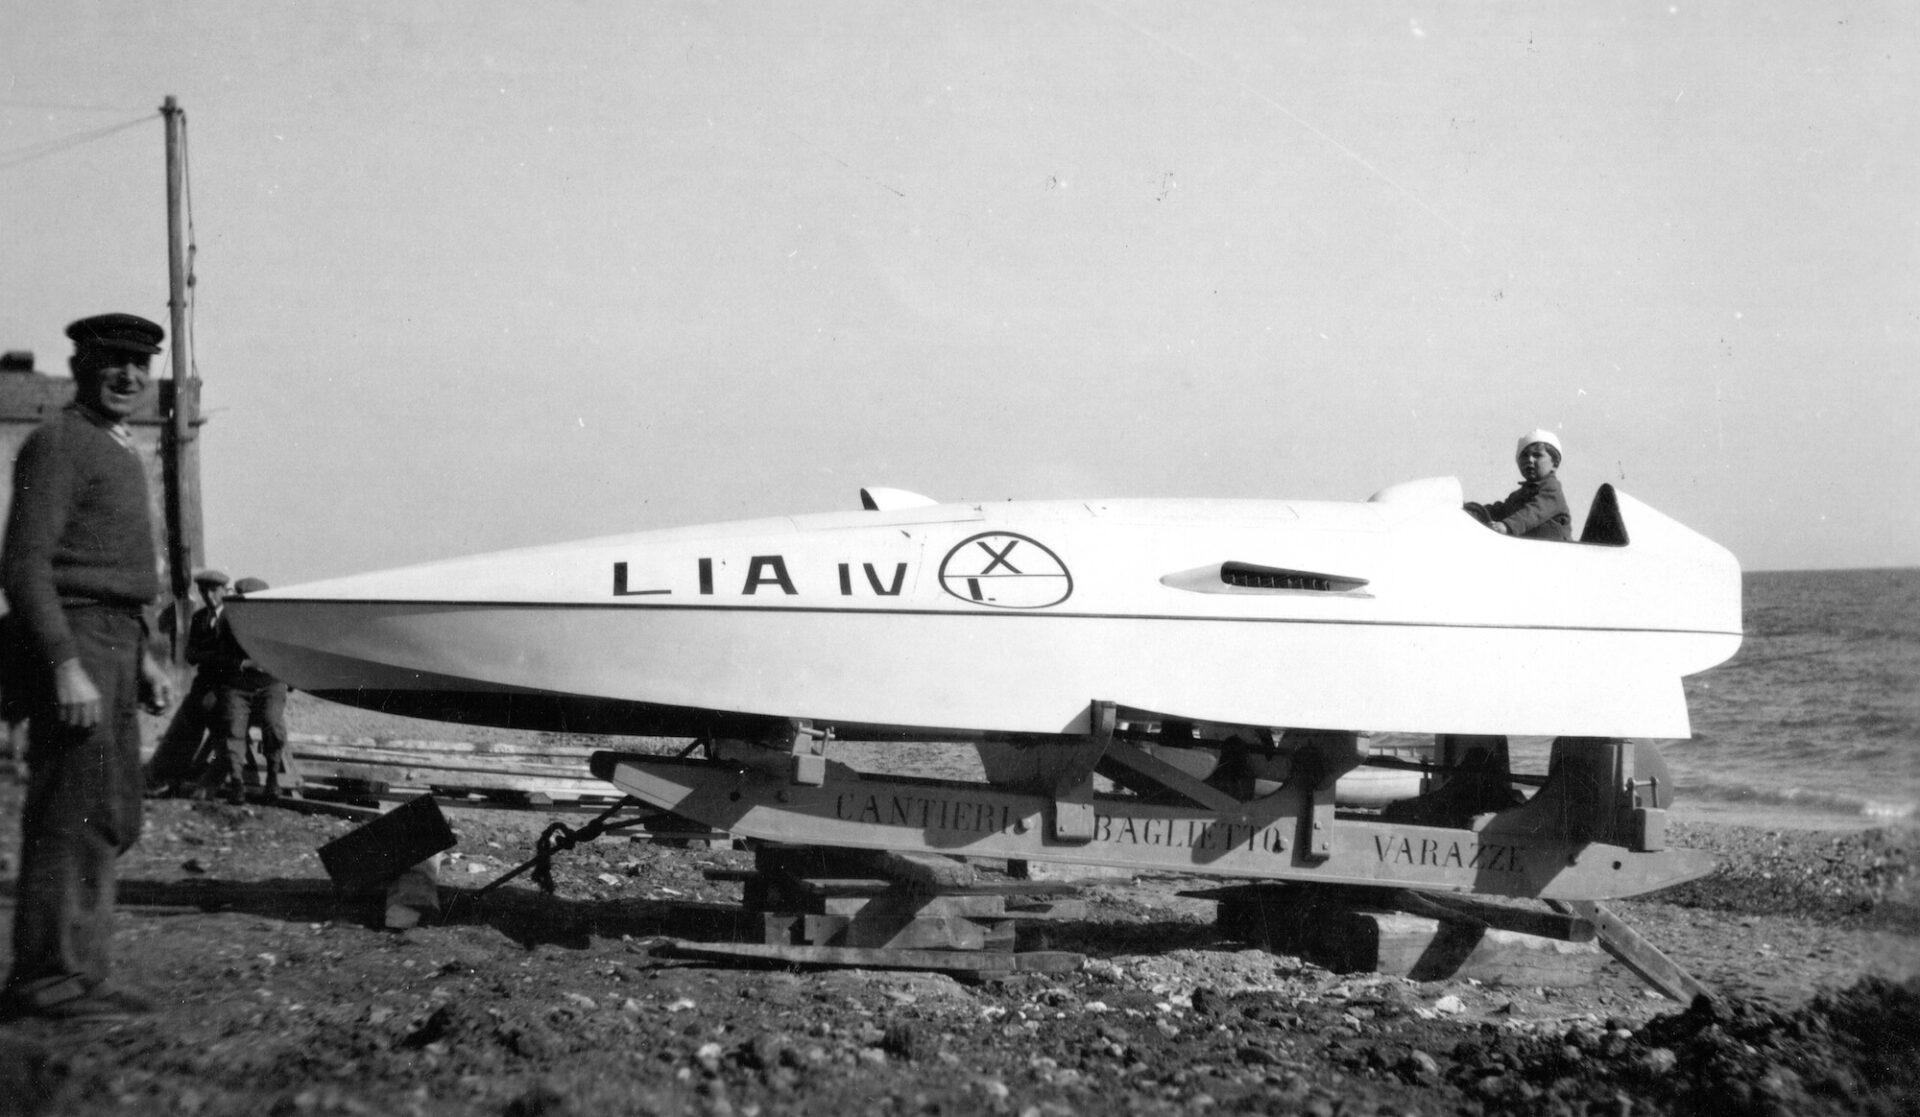 1934 - Racer Lia IV di Antonio Becchi